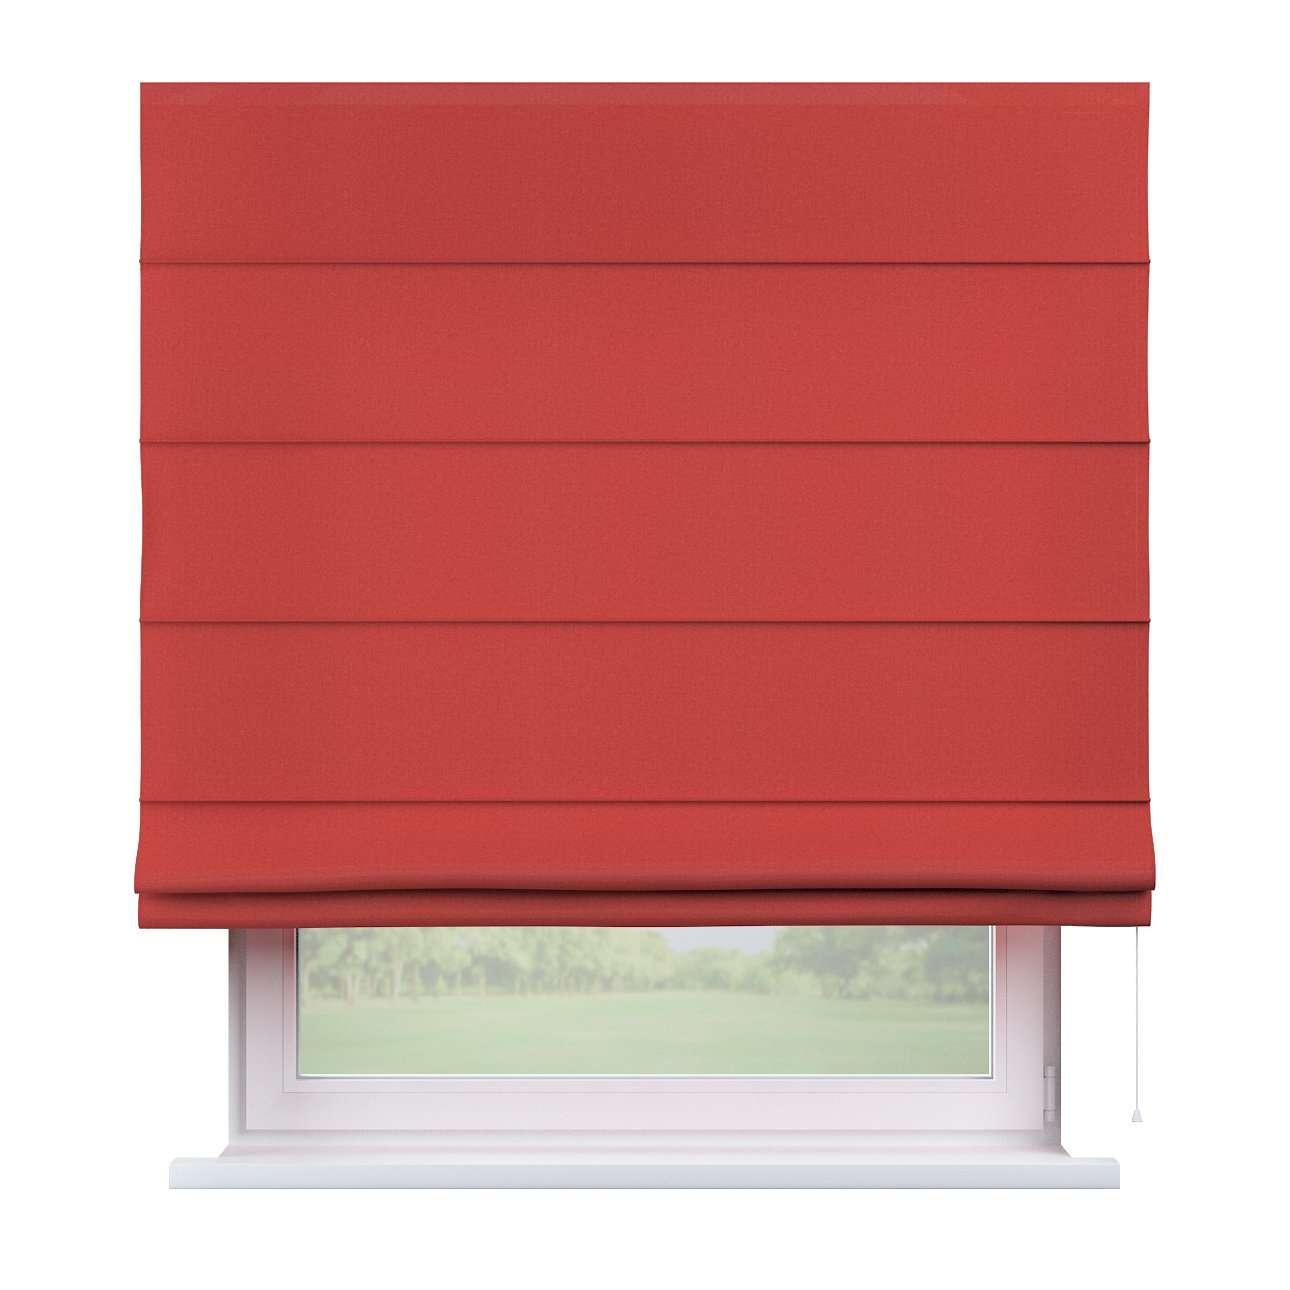 raffrollo capri rot 80 170 cm wooly gaestehausmargot. Black Bedroom Furniture Sets. Home Design Ideas